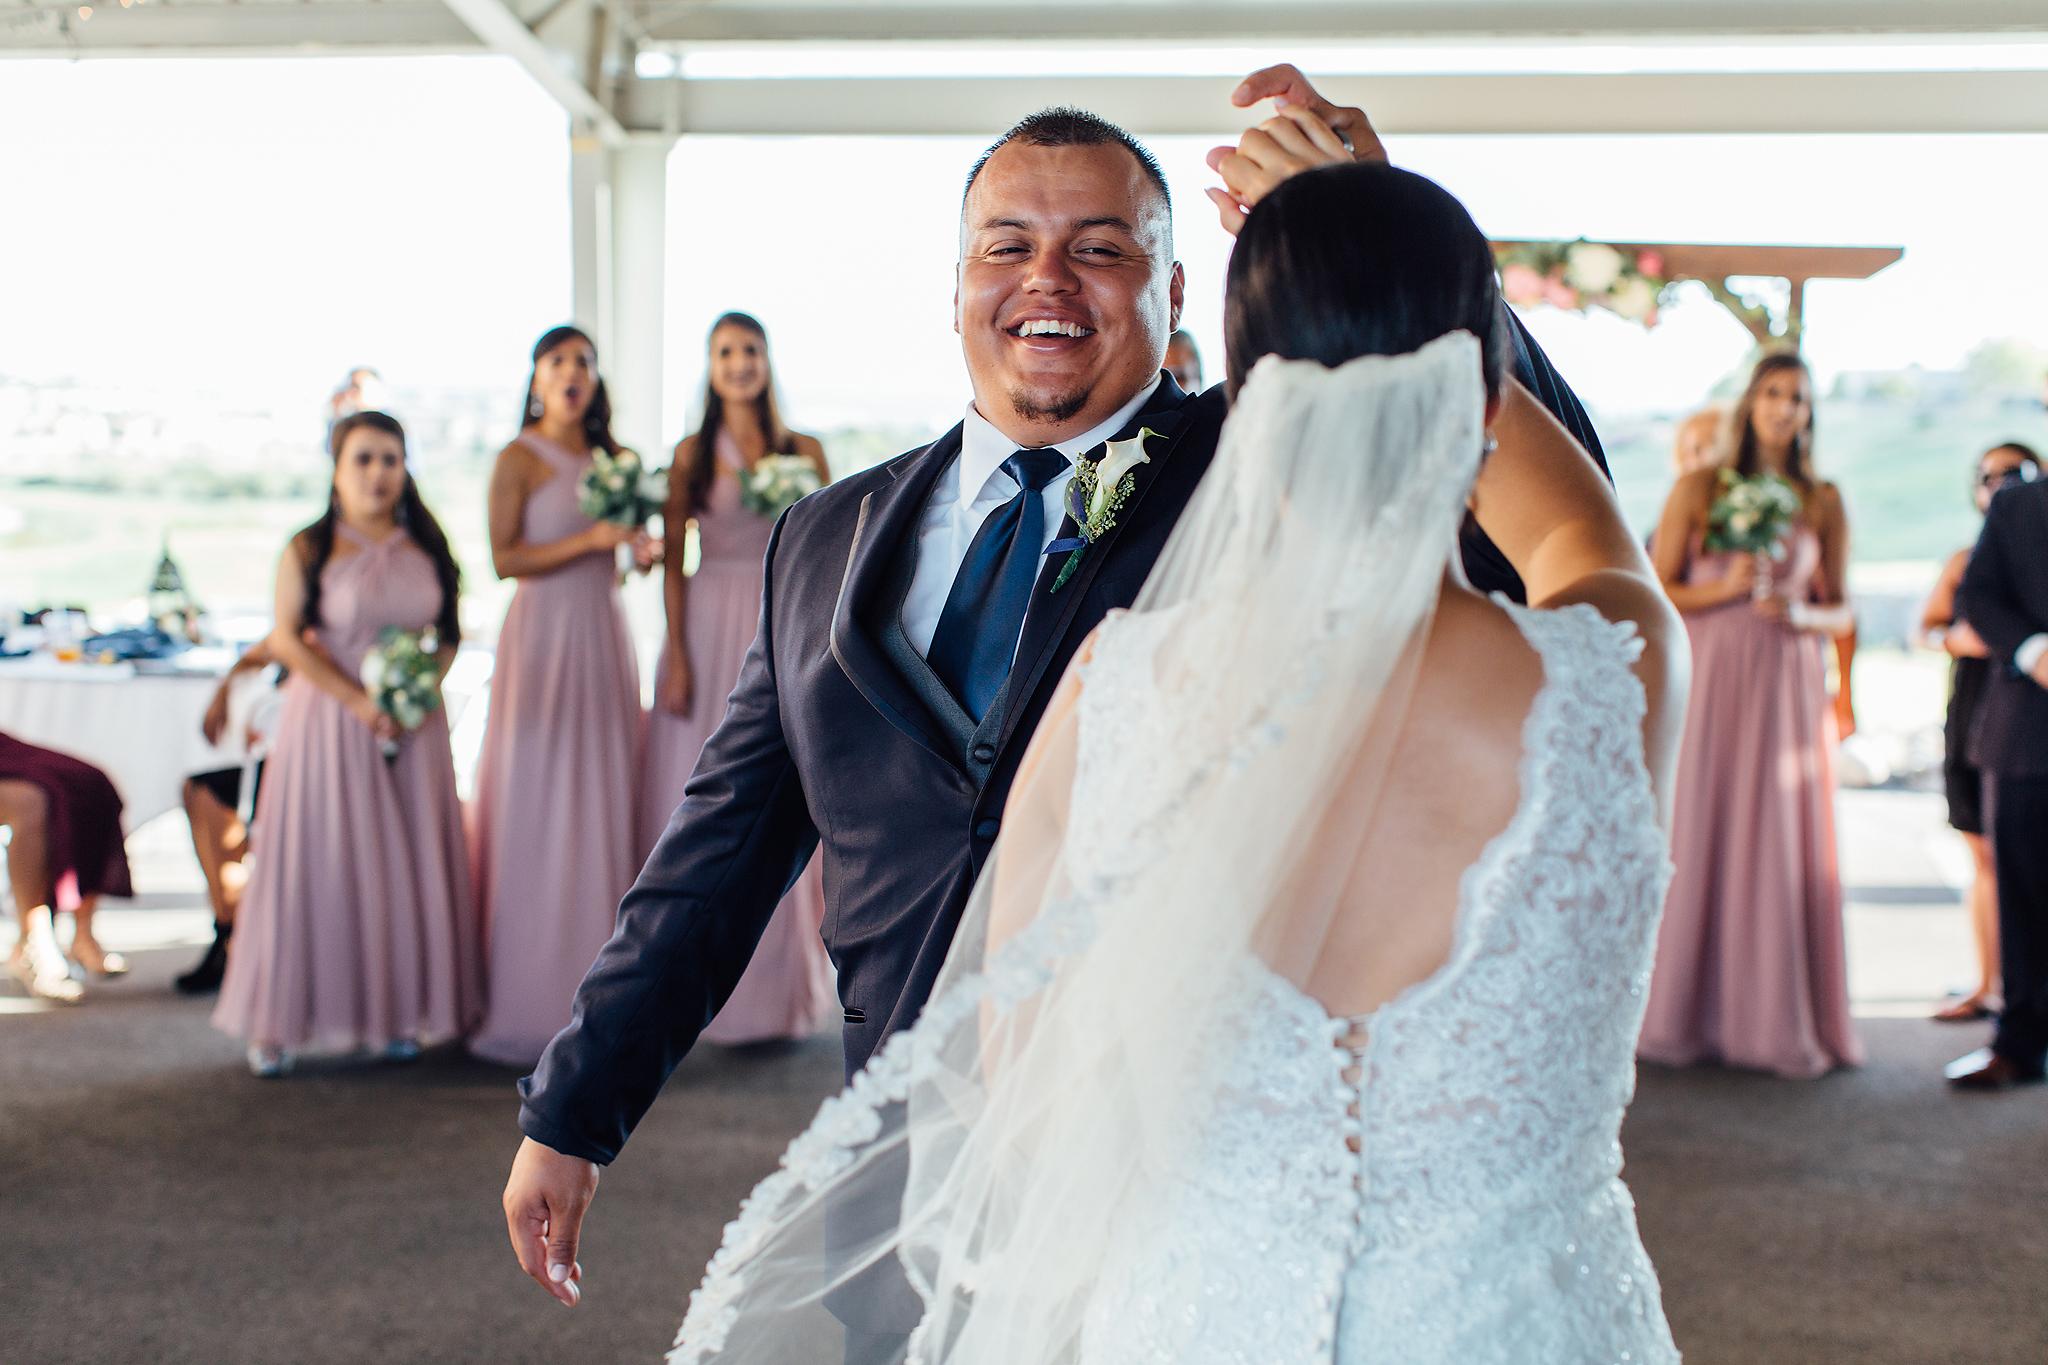 sonoma-ranch-wedding_30.jpg